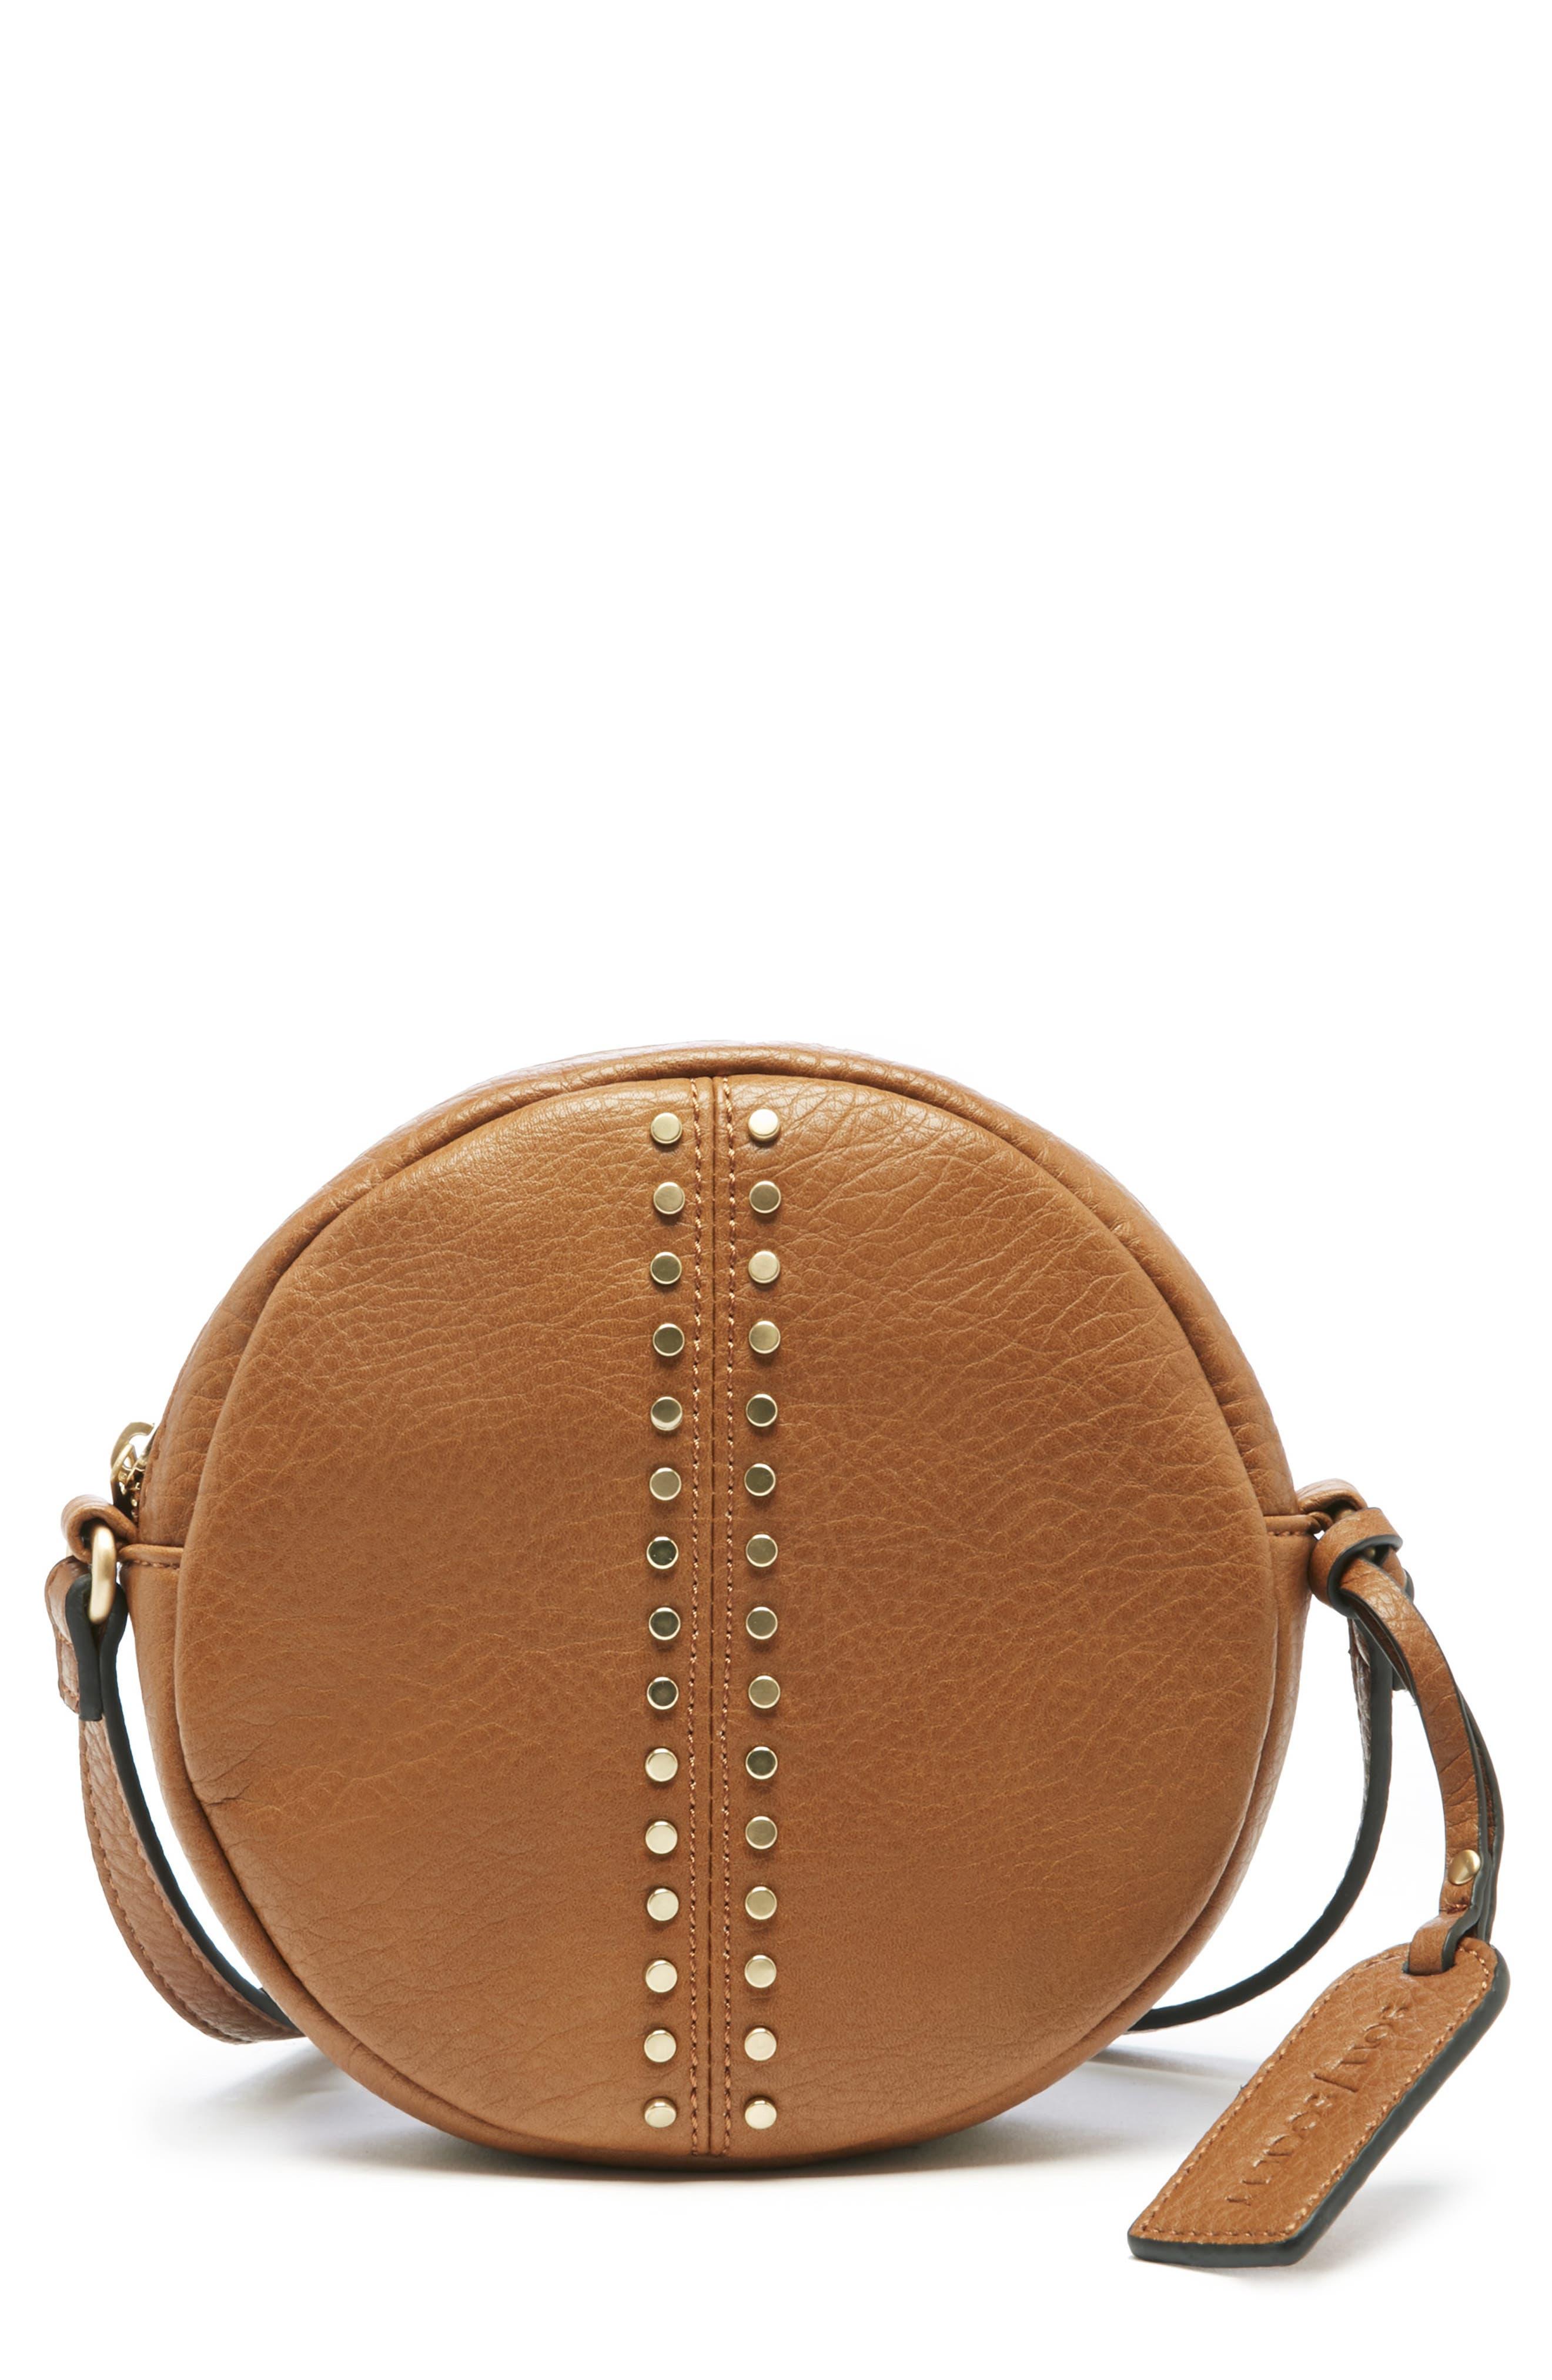 Bayle Faux Leather Crossbody,                         Main,                         color, COGNAC